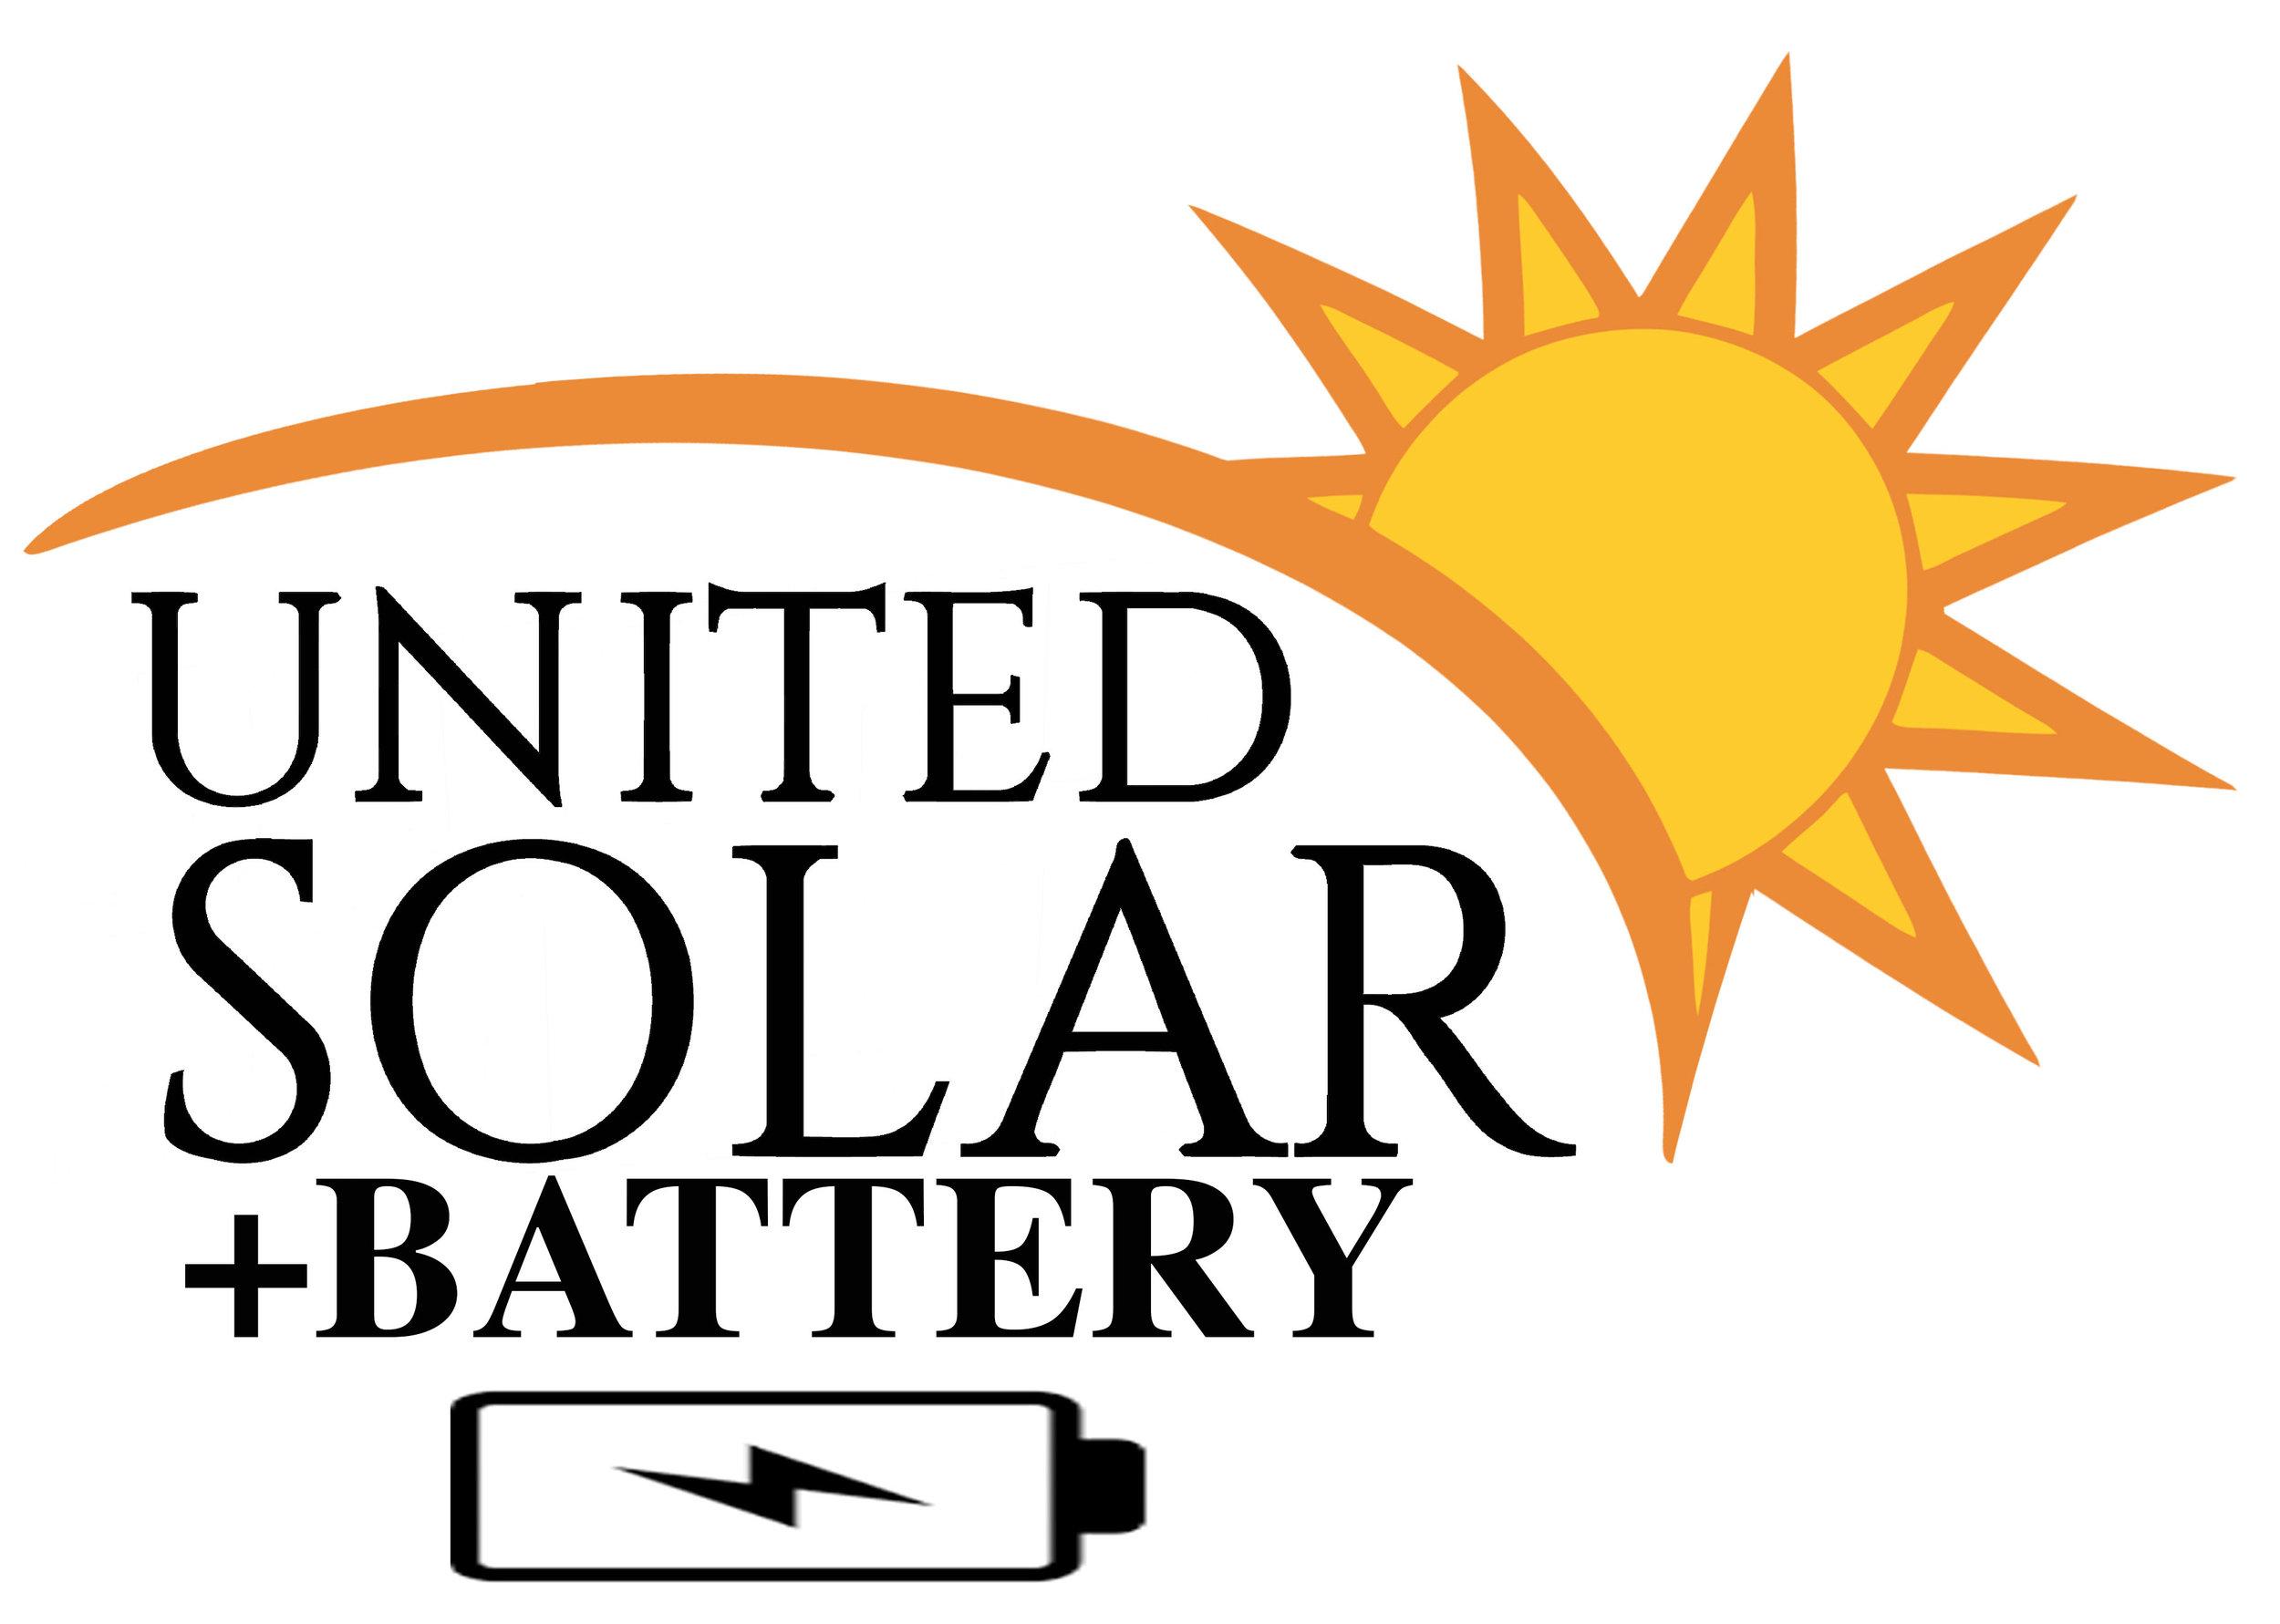 United Solar updated.jpg